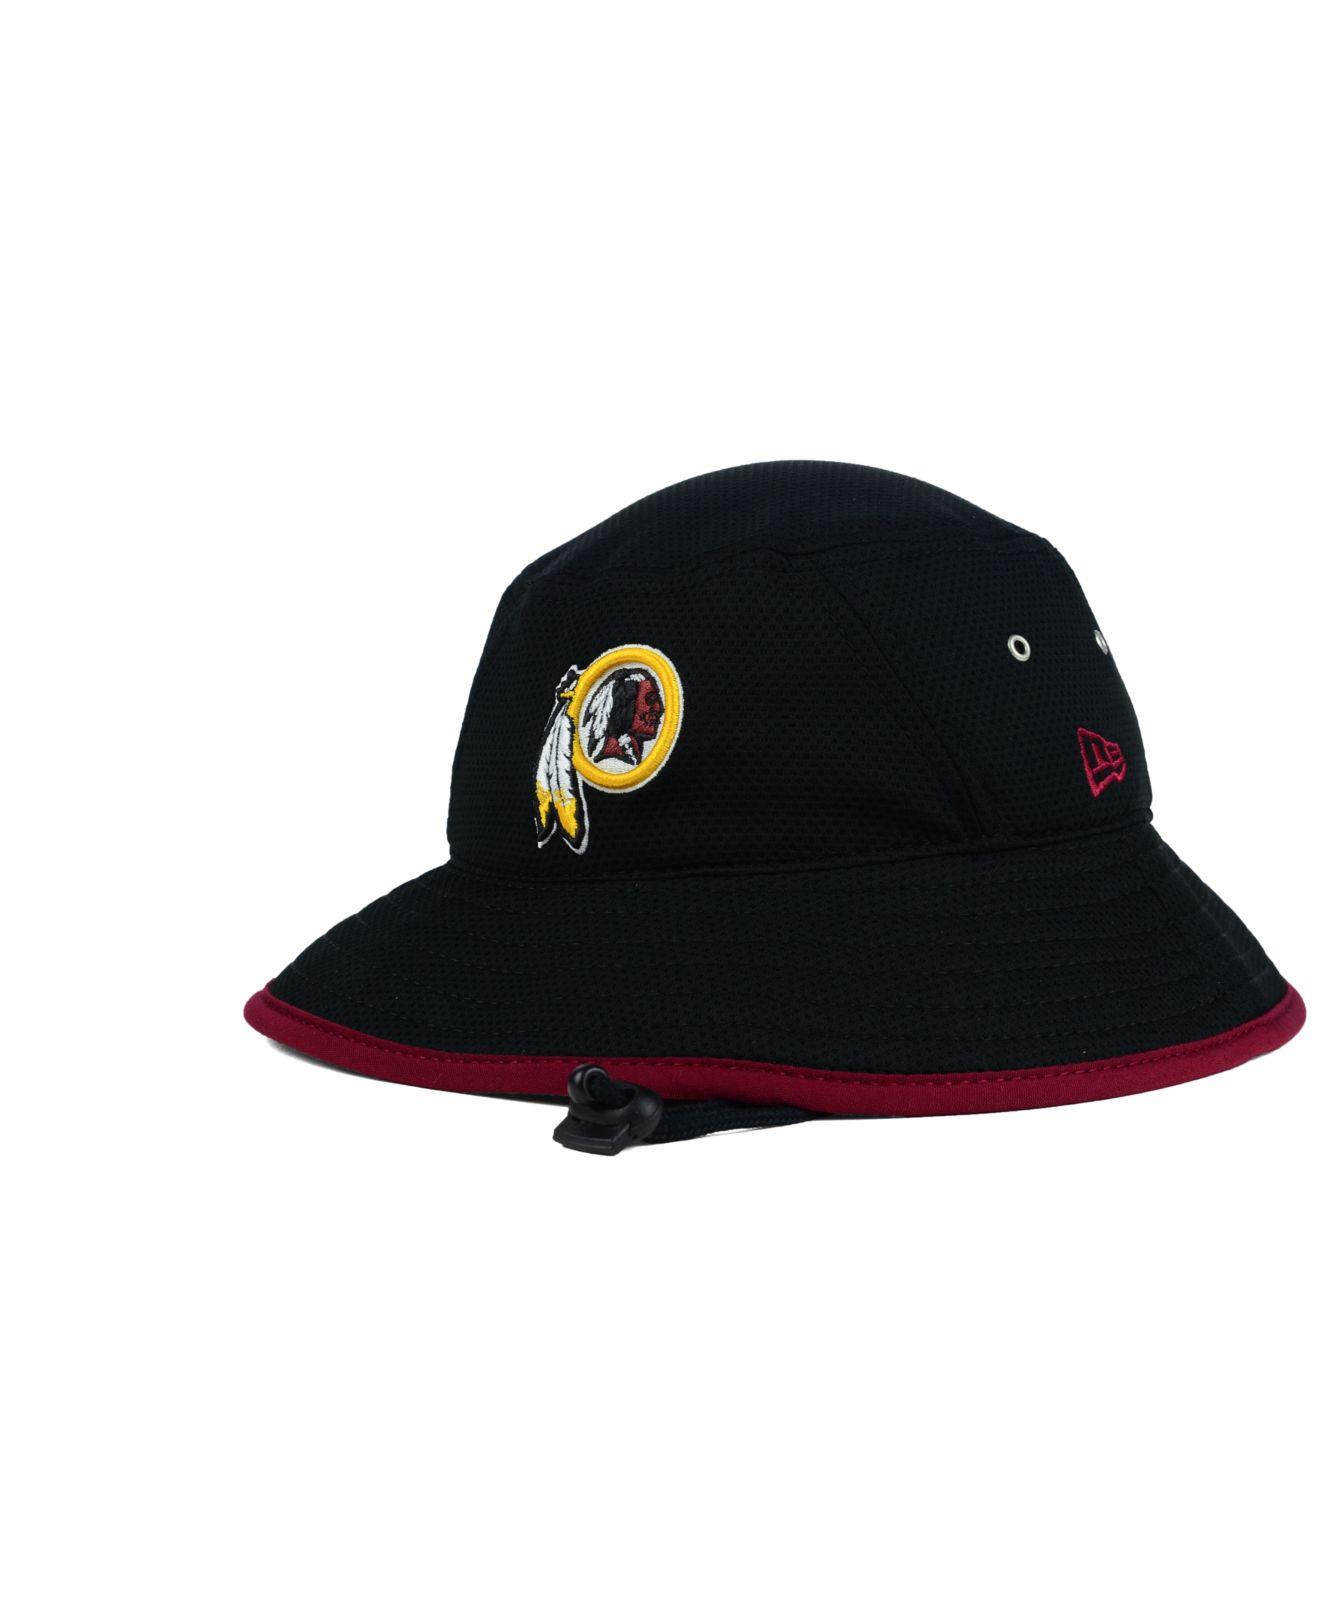 Lyst - KTZ Washington Redskins Training Bucket Hat in Black for Men 895ba988c20